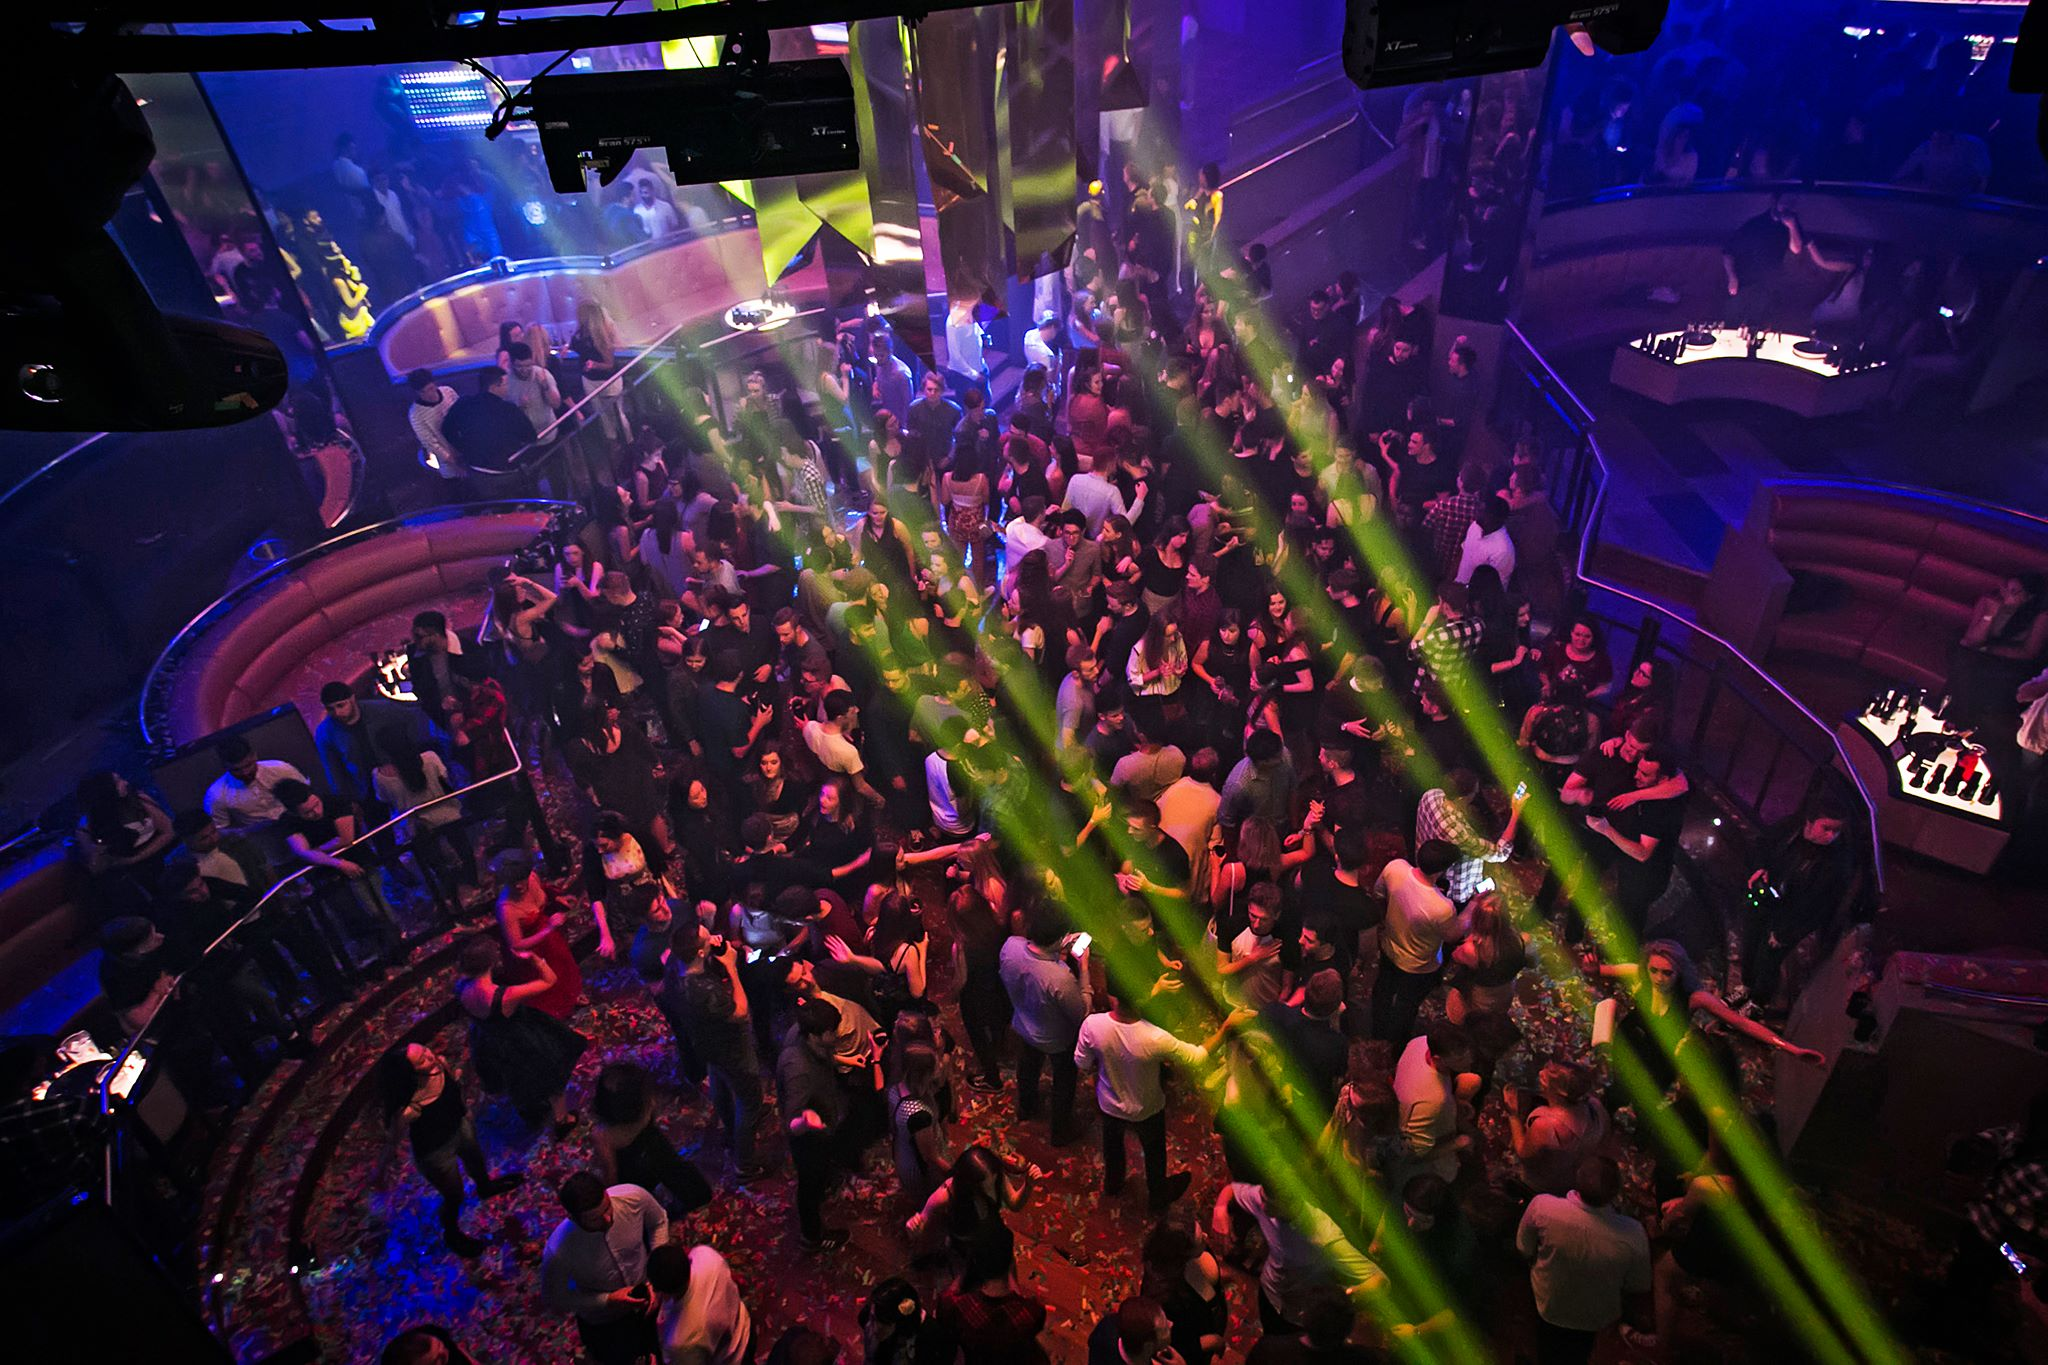 Pryzm Birmingham Gigantic Nightclub On Broad Street